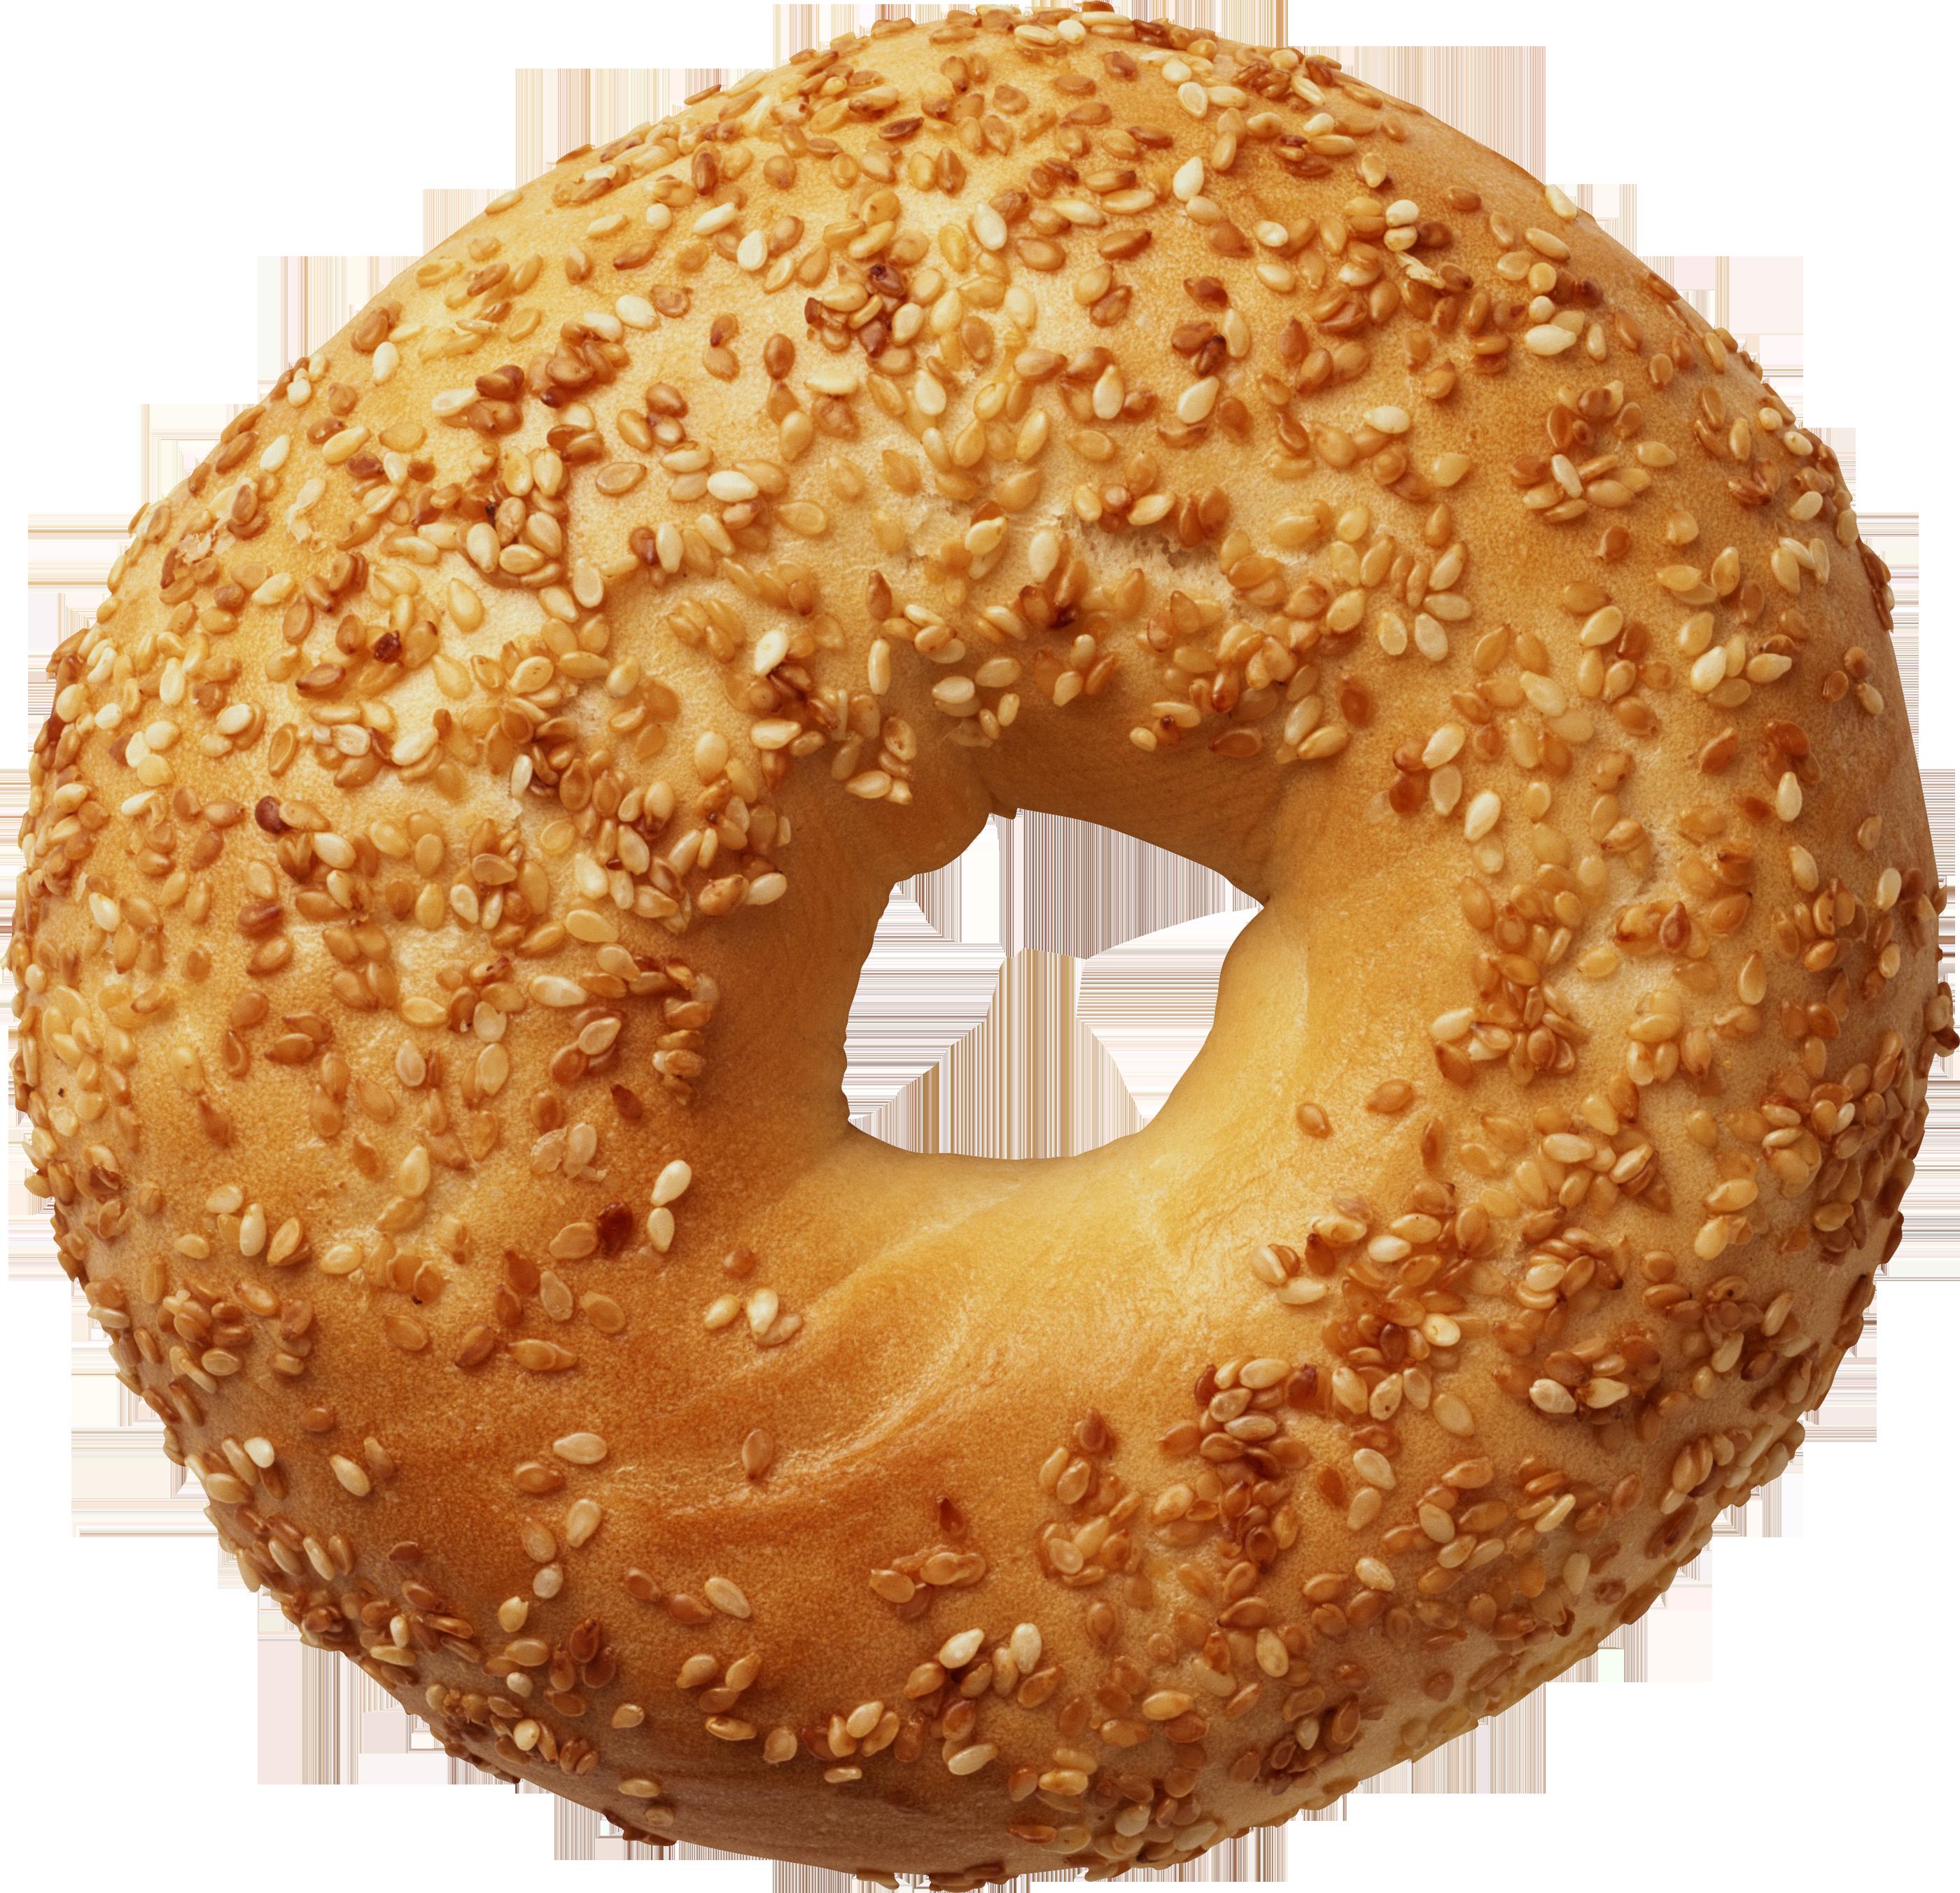 Png . Doughnut clipart sugar donut